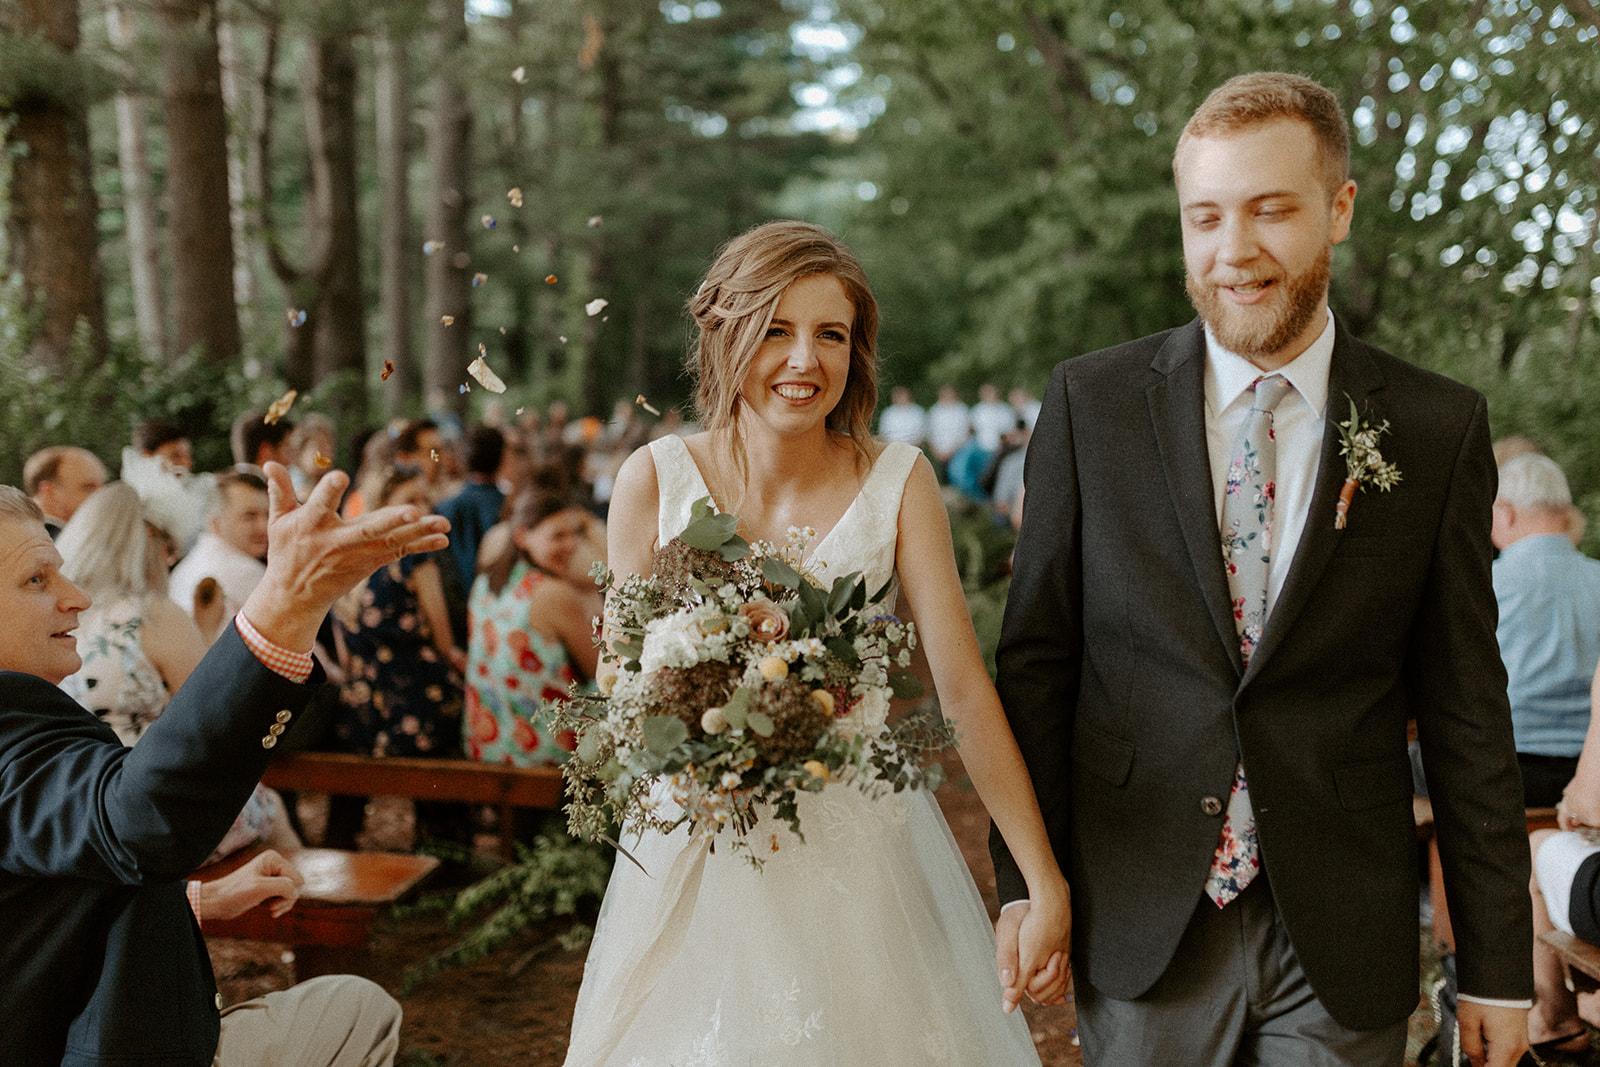 camp_wokanda_peoria_illinois_wedding_photographer_wright_photographs_bliese_0289.jpg